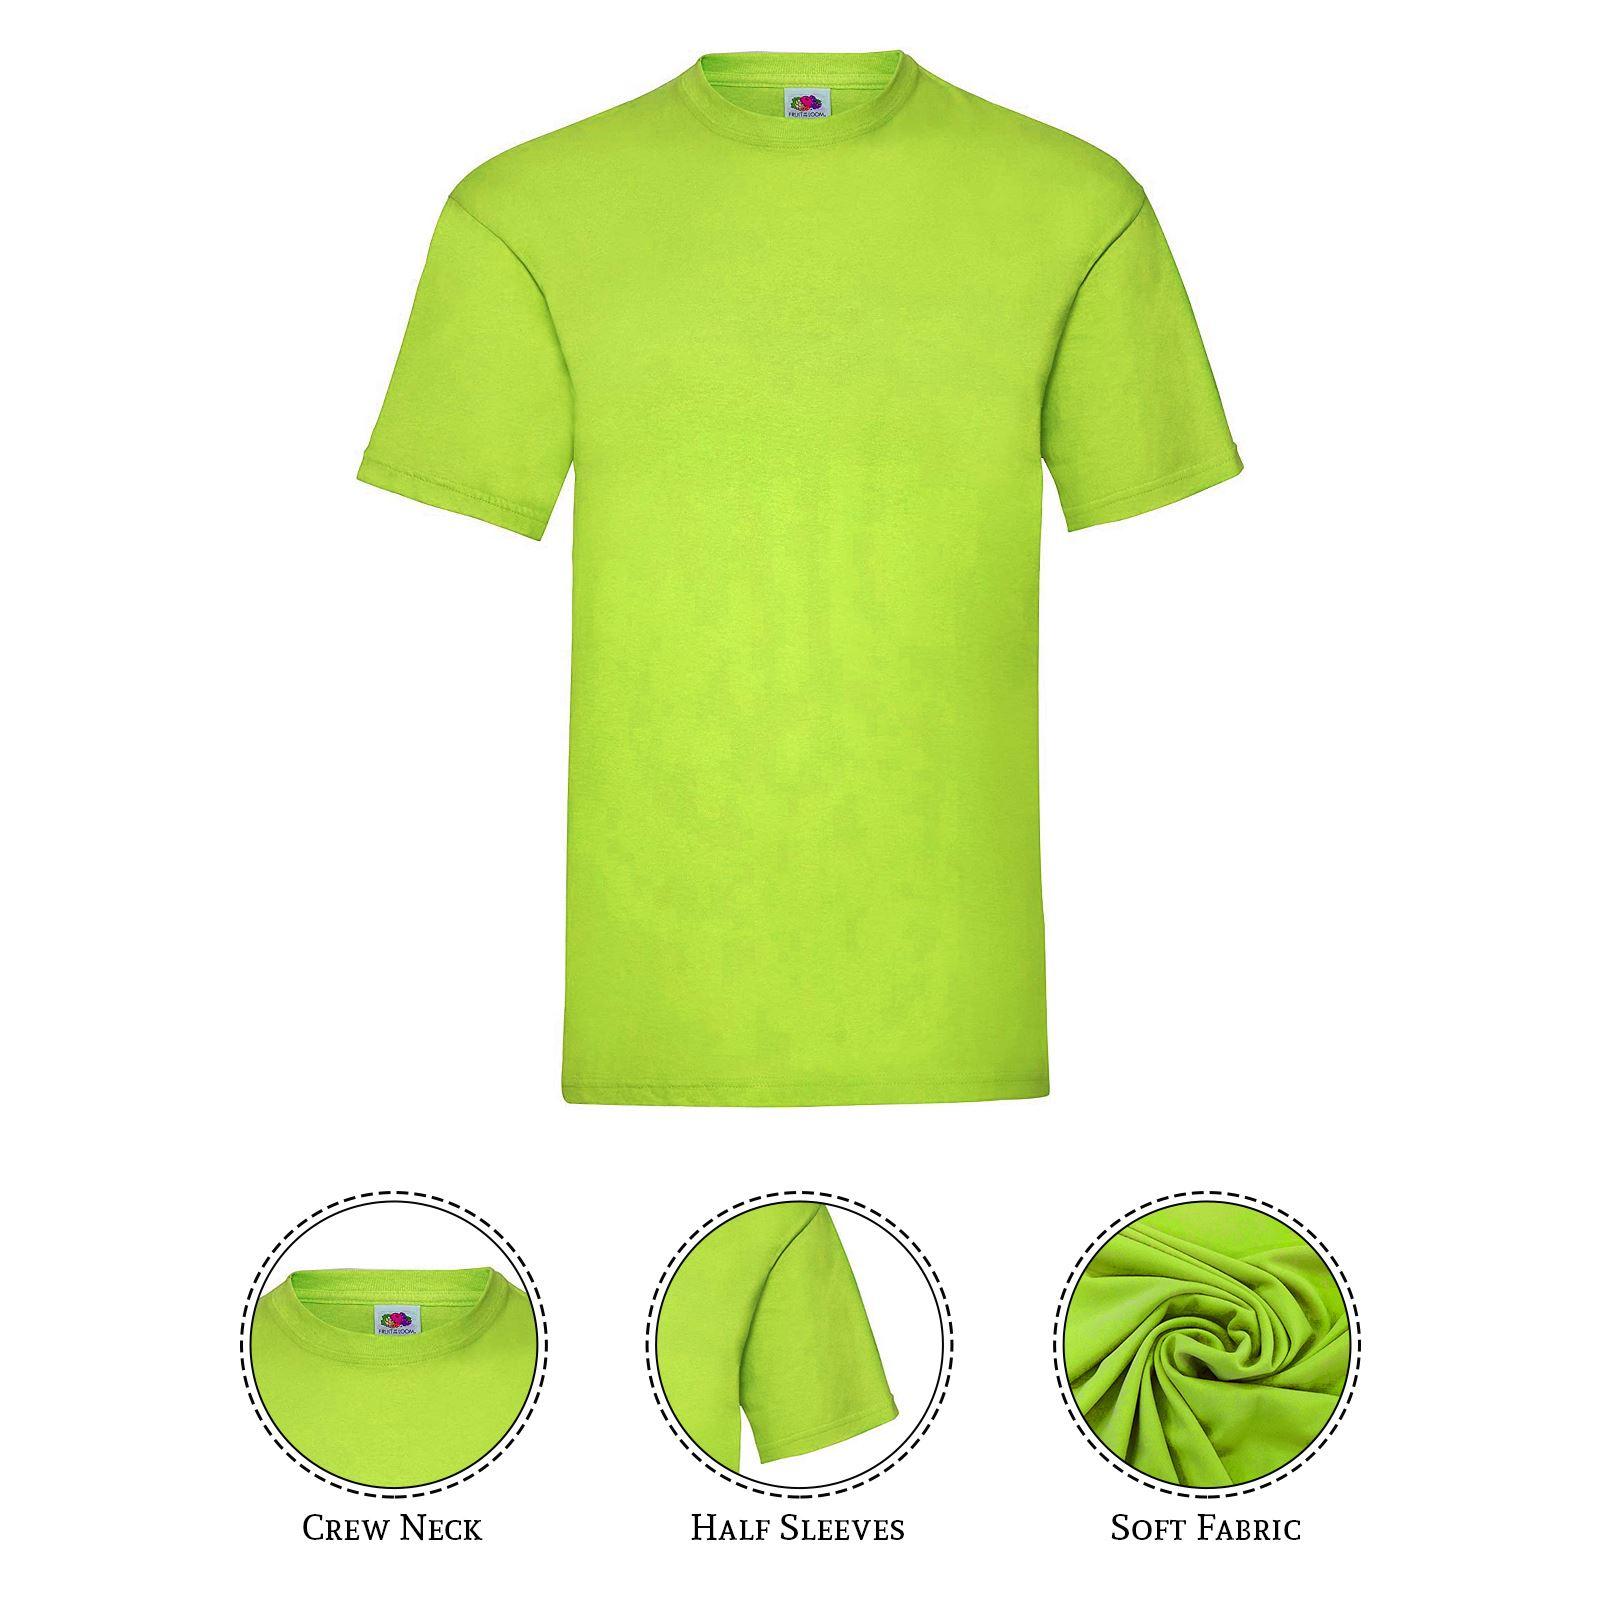 thumbnail 27 - Men-s-Fruit-Of-The-Loom-T-Shirt-Original-100-Cotton-Casual-Plain-Top-Tee